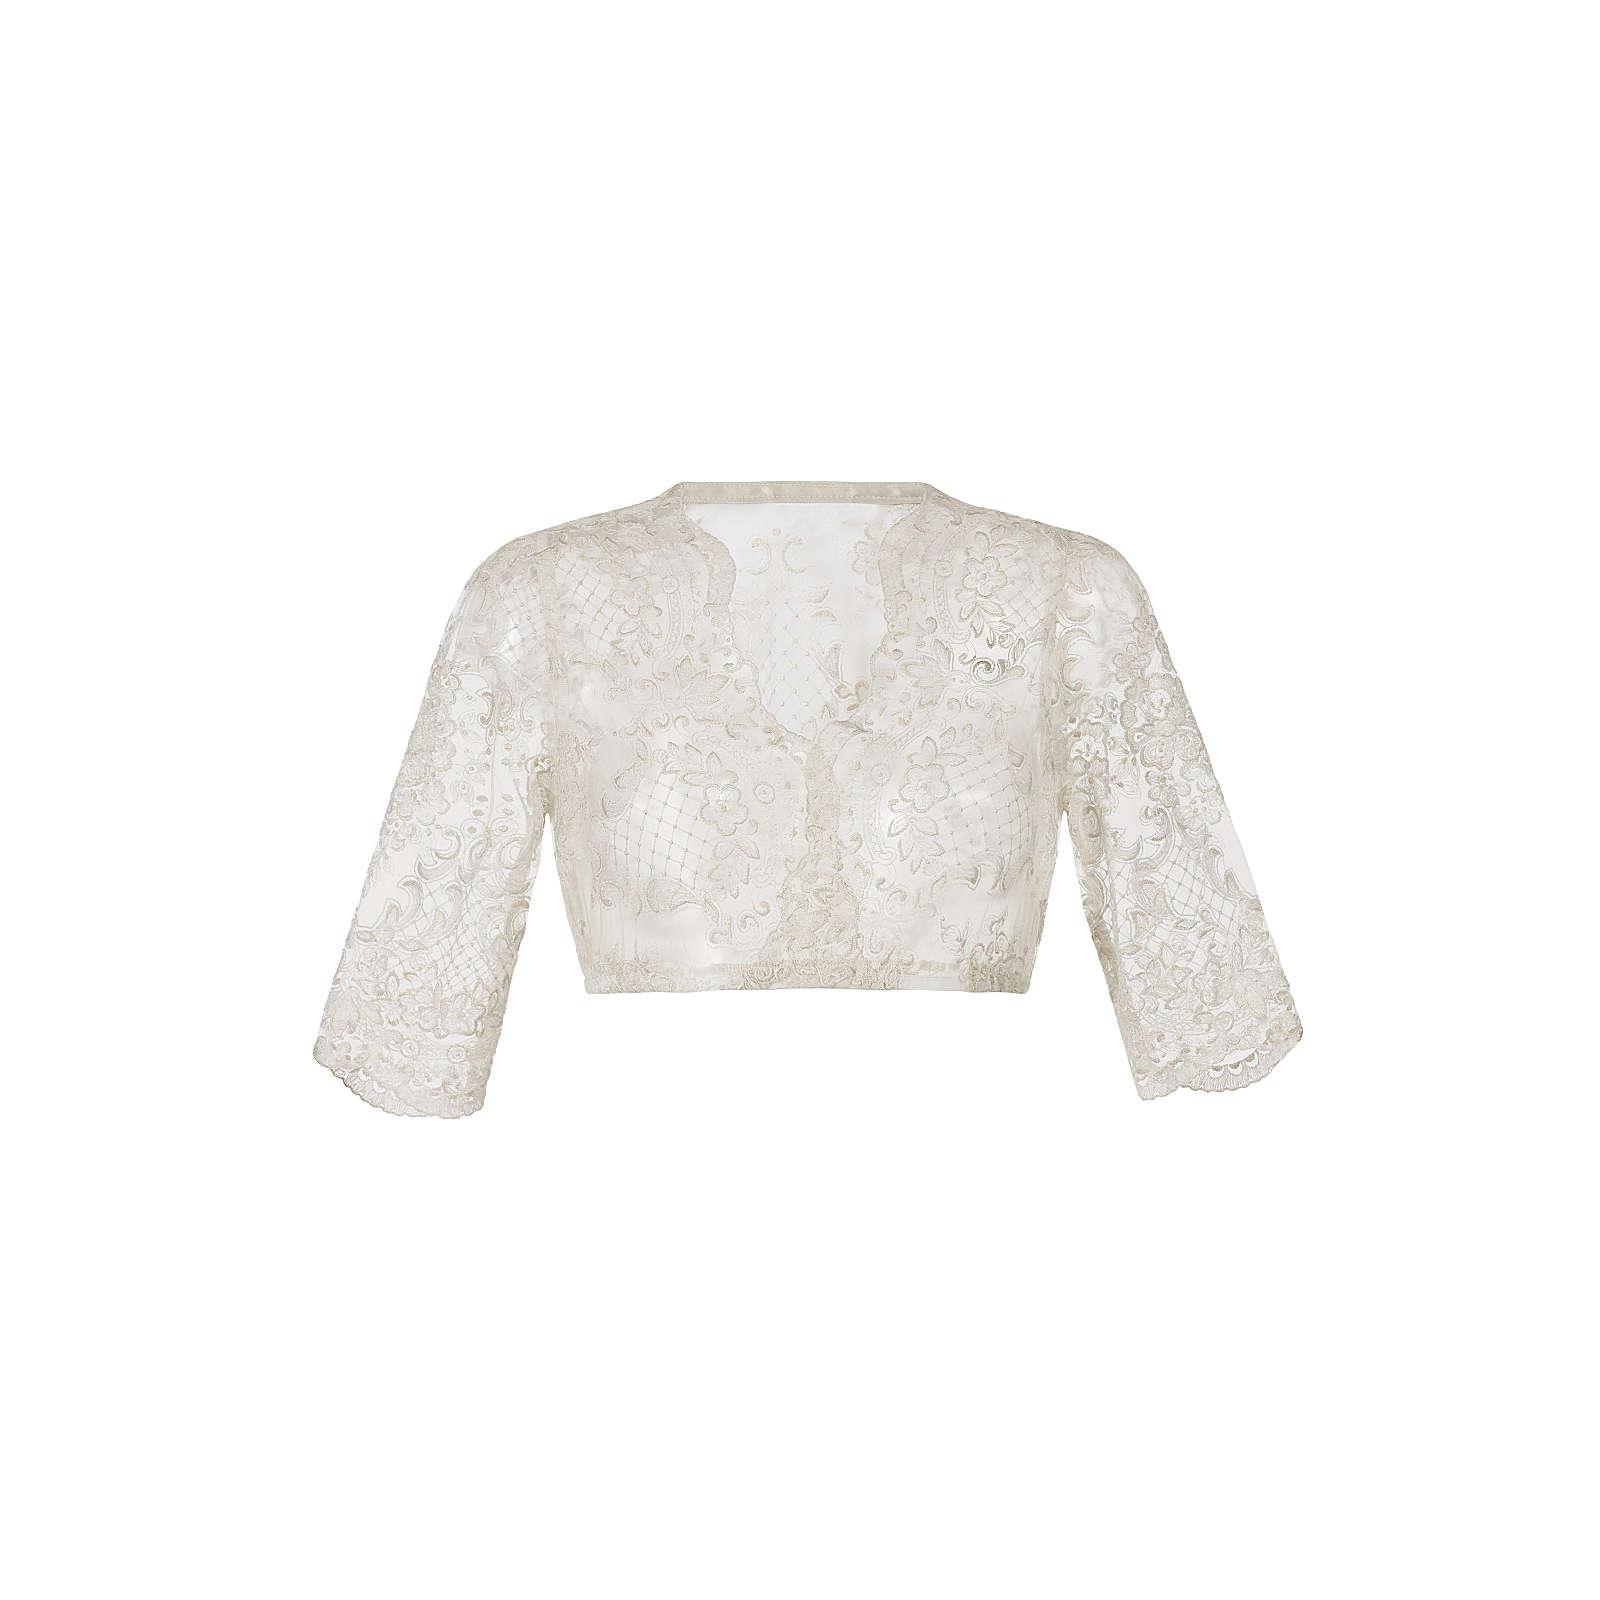 Stockerpoint Bluse beige Damen Gr. 34